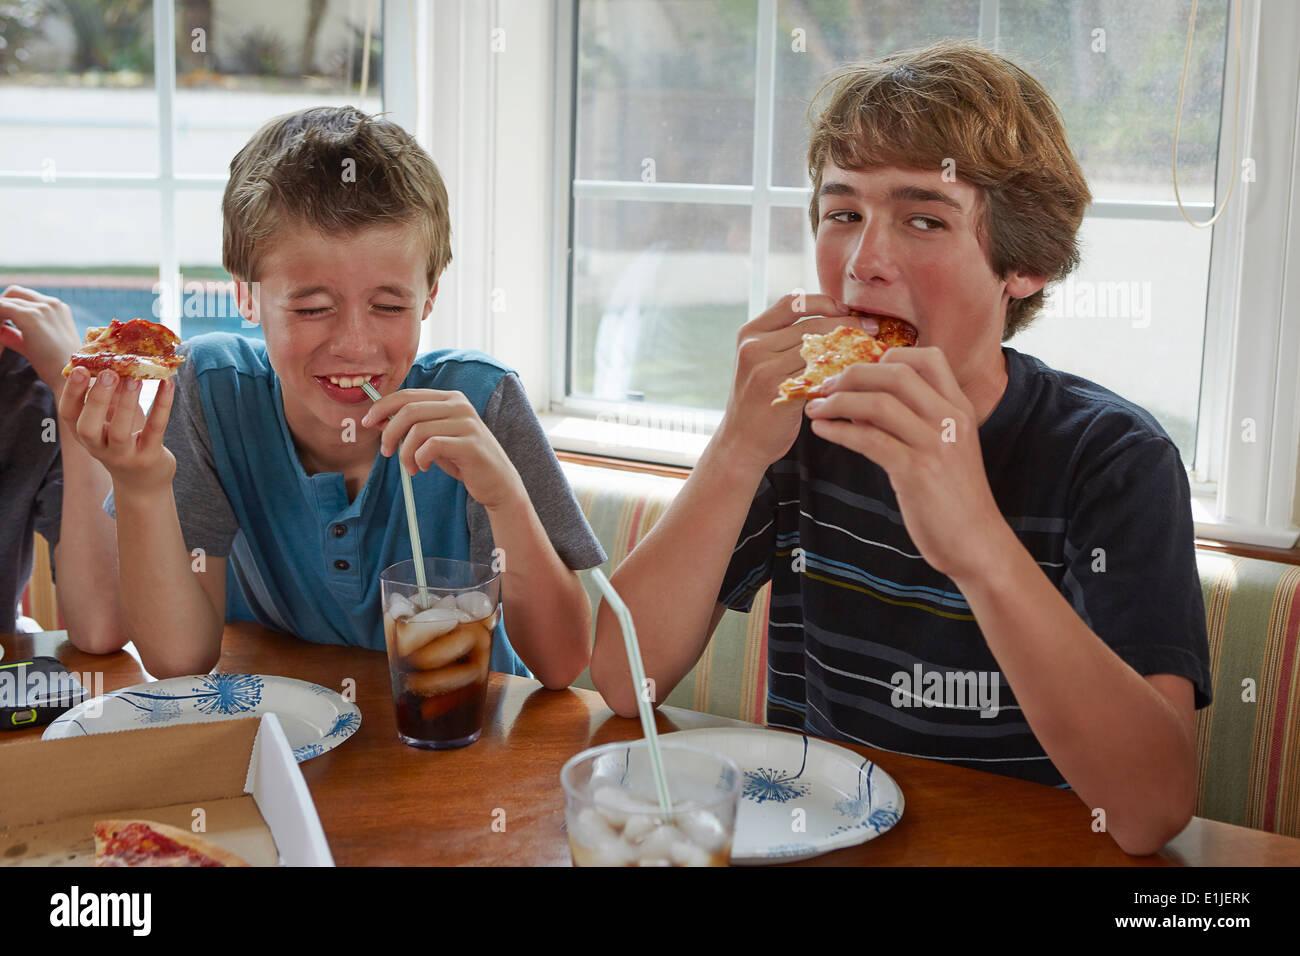 Les garçons eating pizza Photo Stock